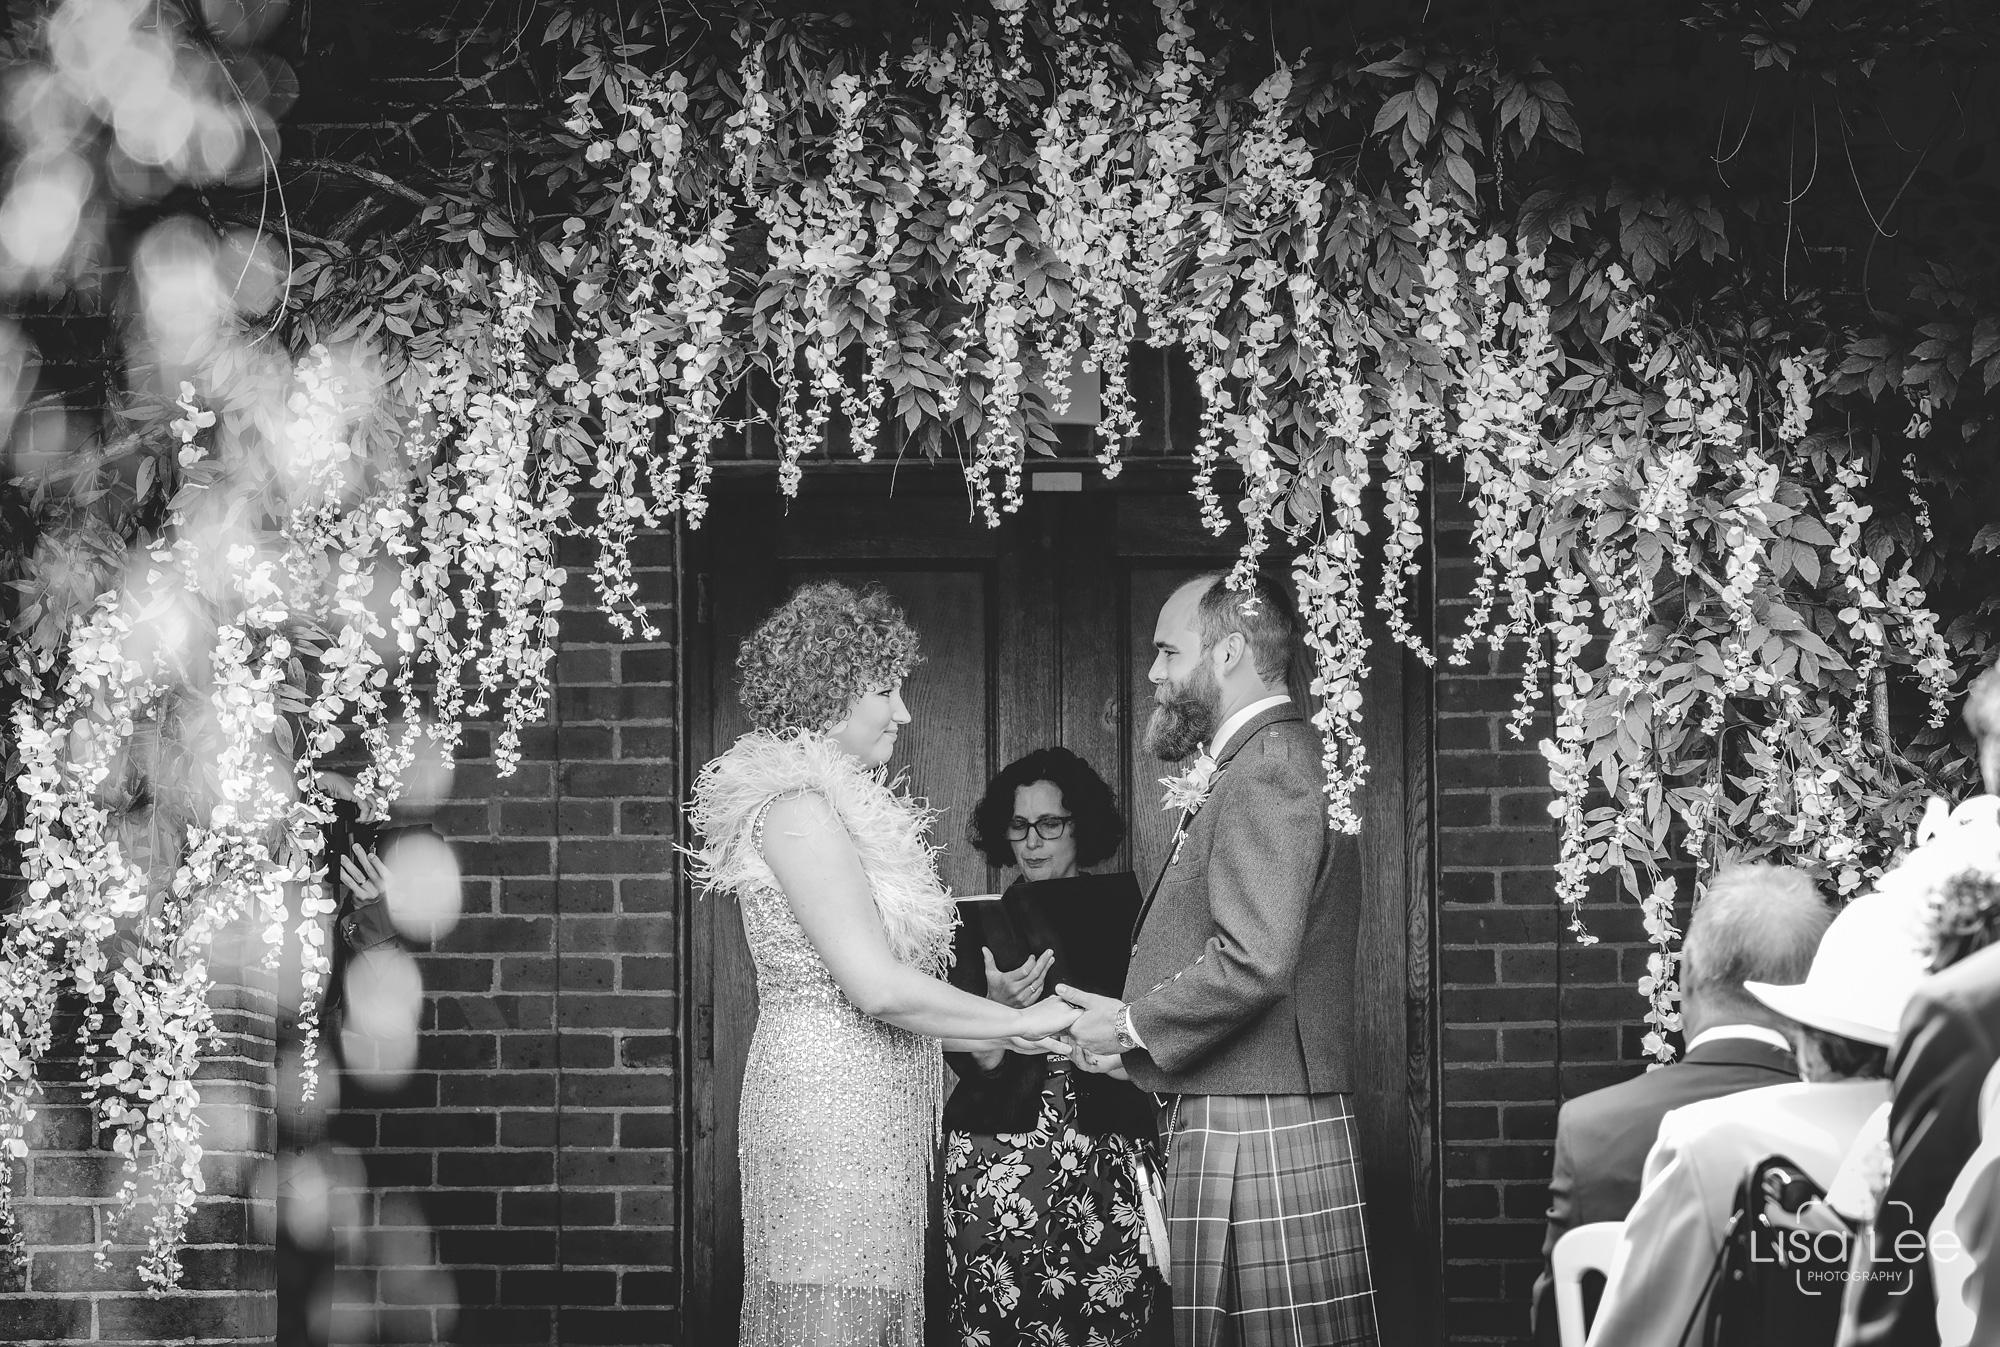 lisa-lee-wedding-photography-ceremony-talbot-heath-20.jpg